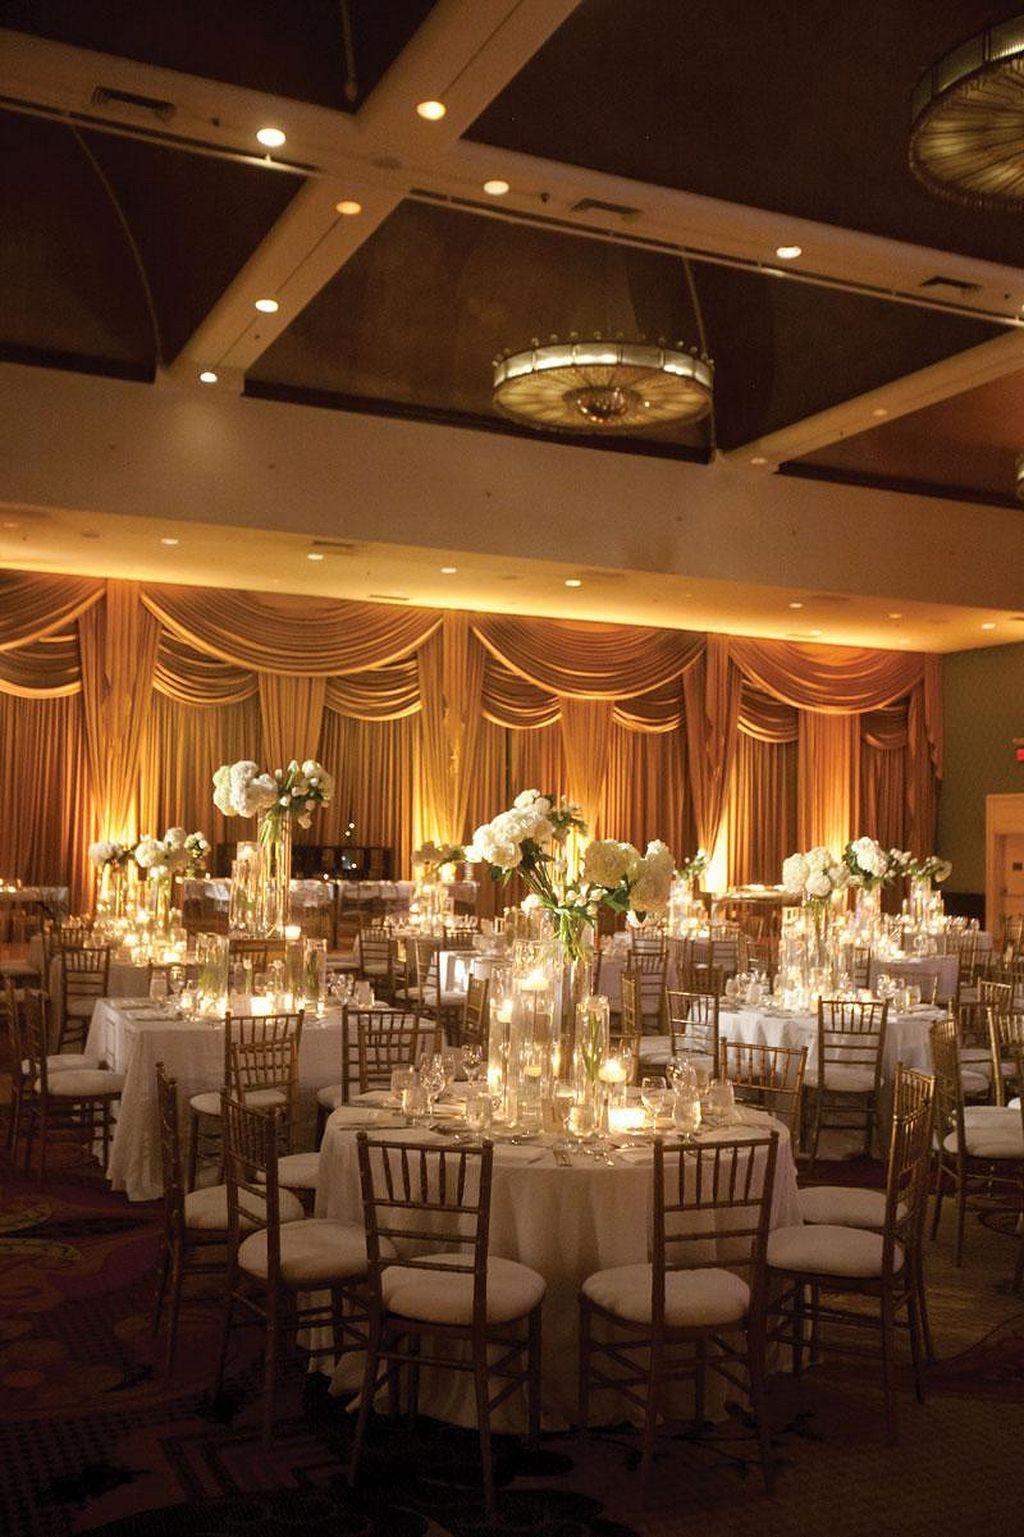 30 beautiful wedding indoor decorations ideas pinterest gorgeous 30 beautiful wedding indoor decorations ideas httpsweddmagz junglespirit Gallery